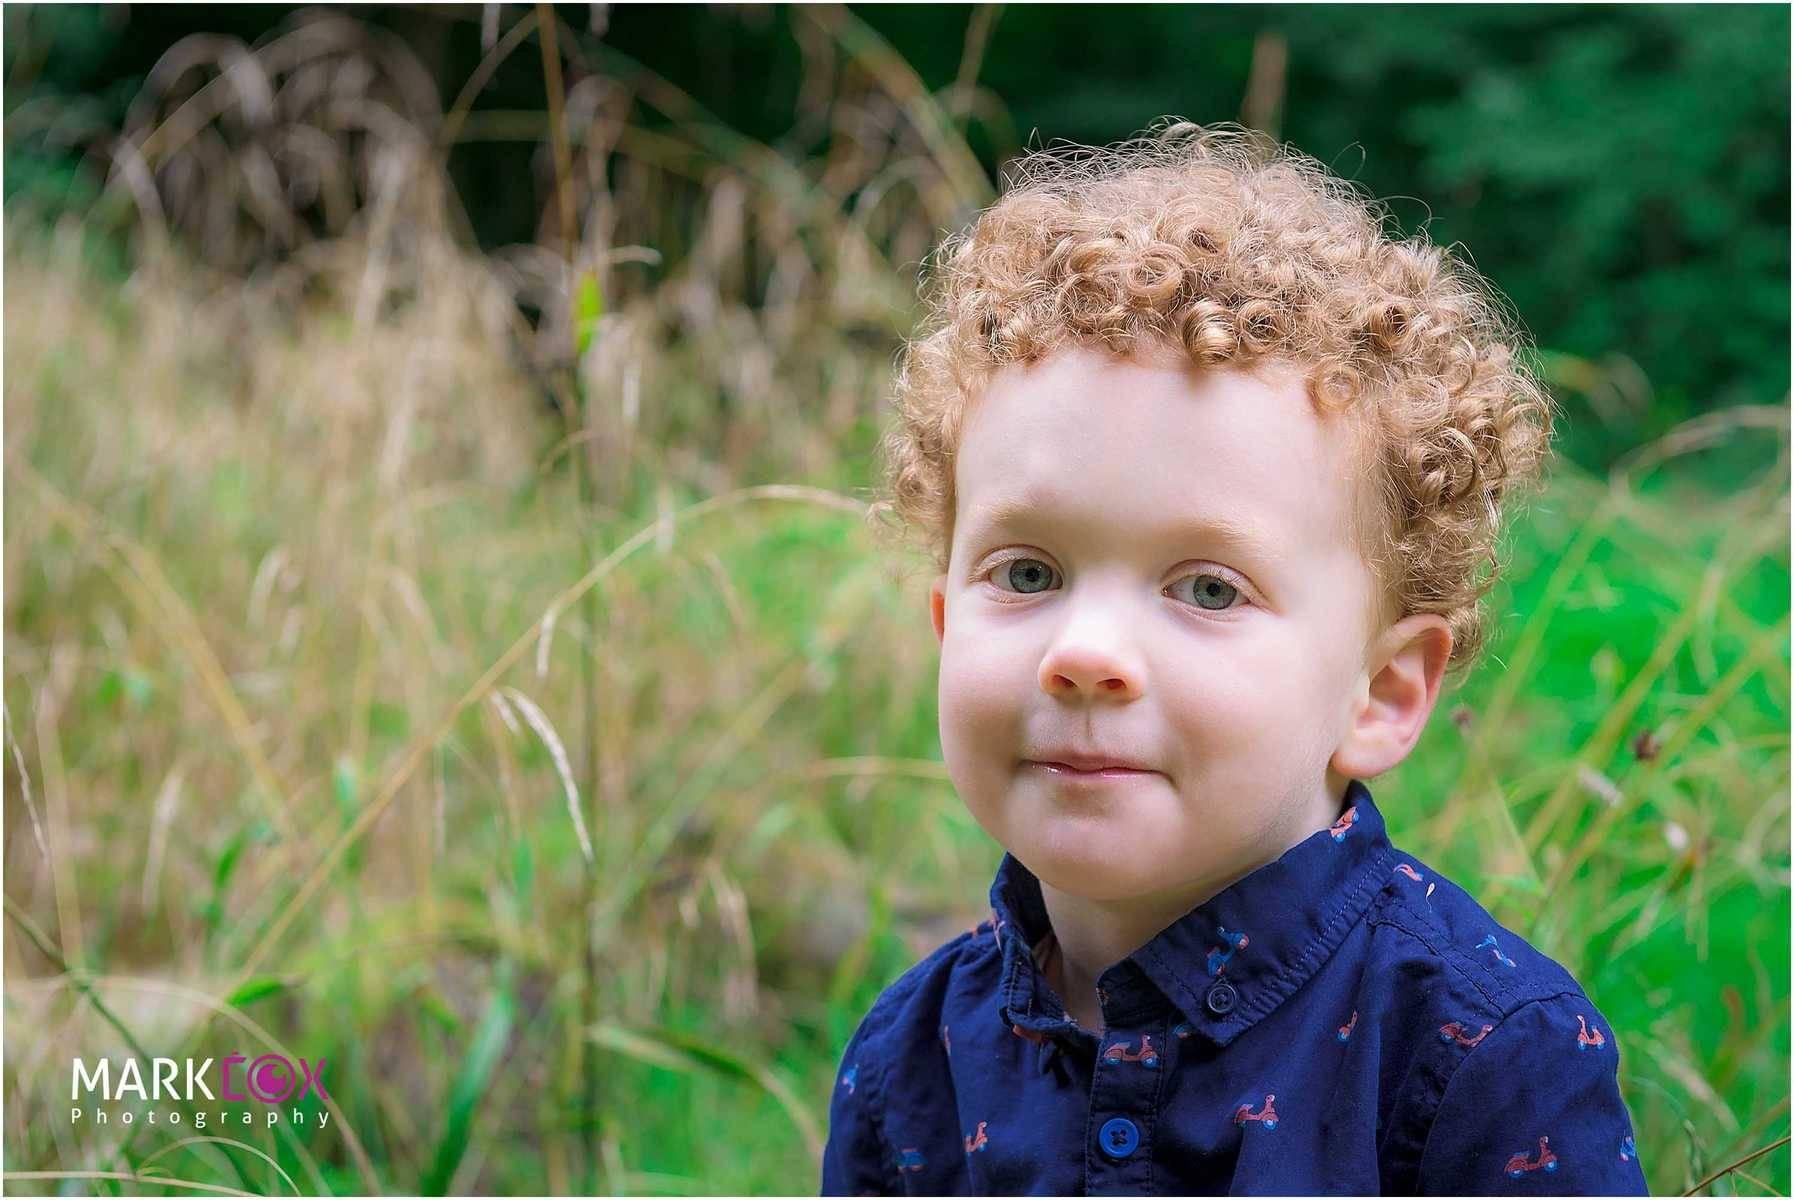 A little boy smiling having his photograph taken